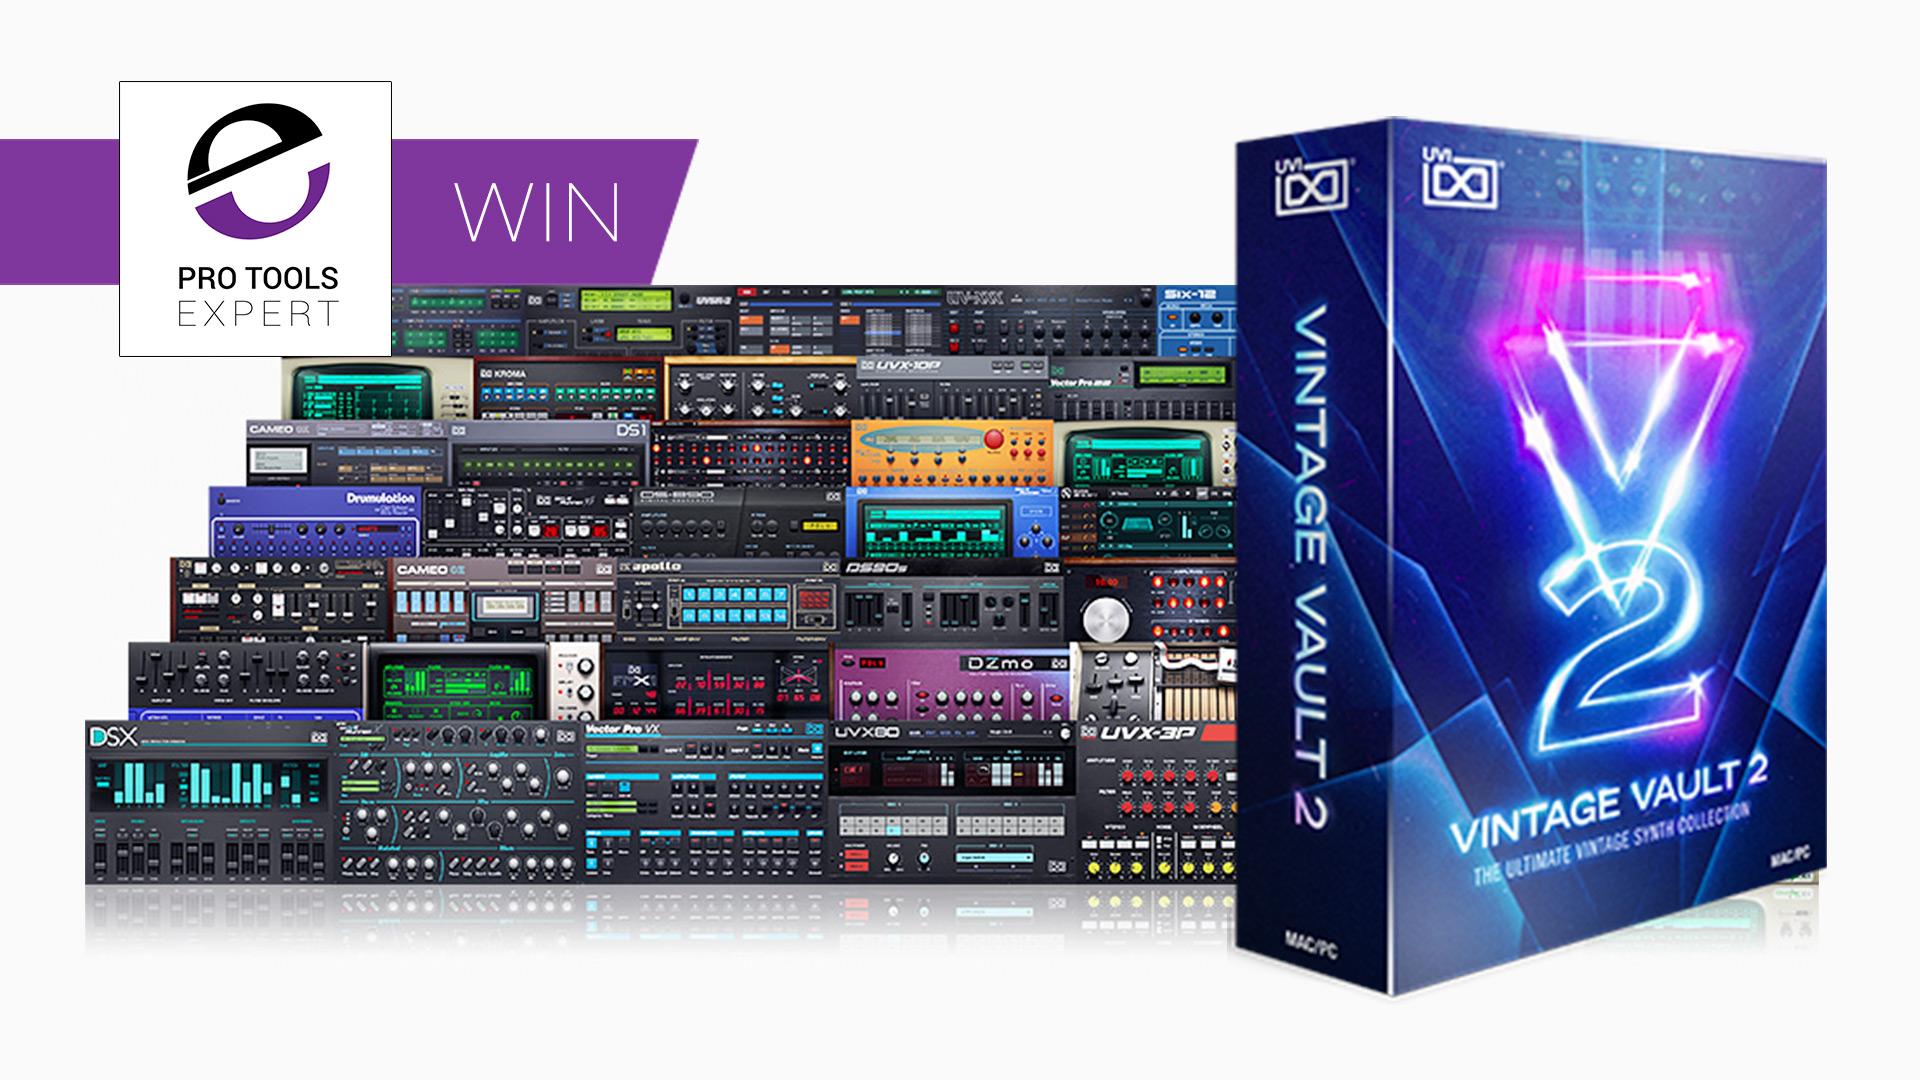 win-uvi-vintage-vault-2-synth-instrument-bundle.jpg